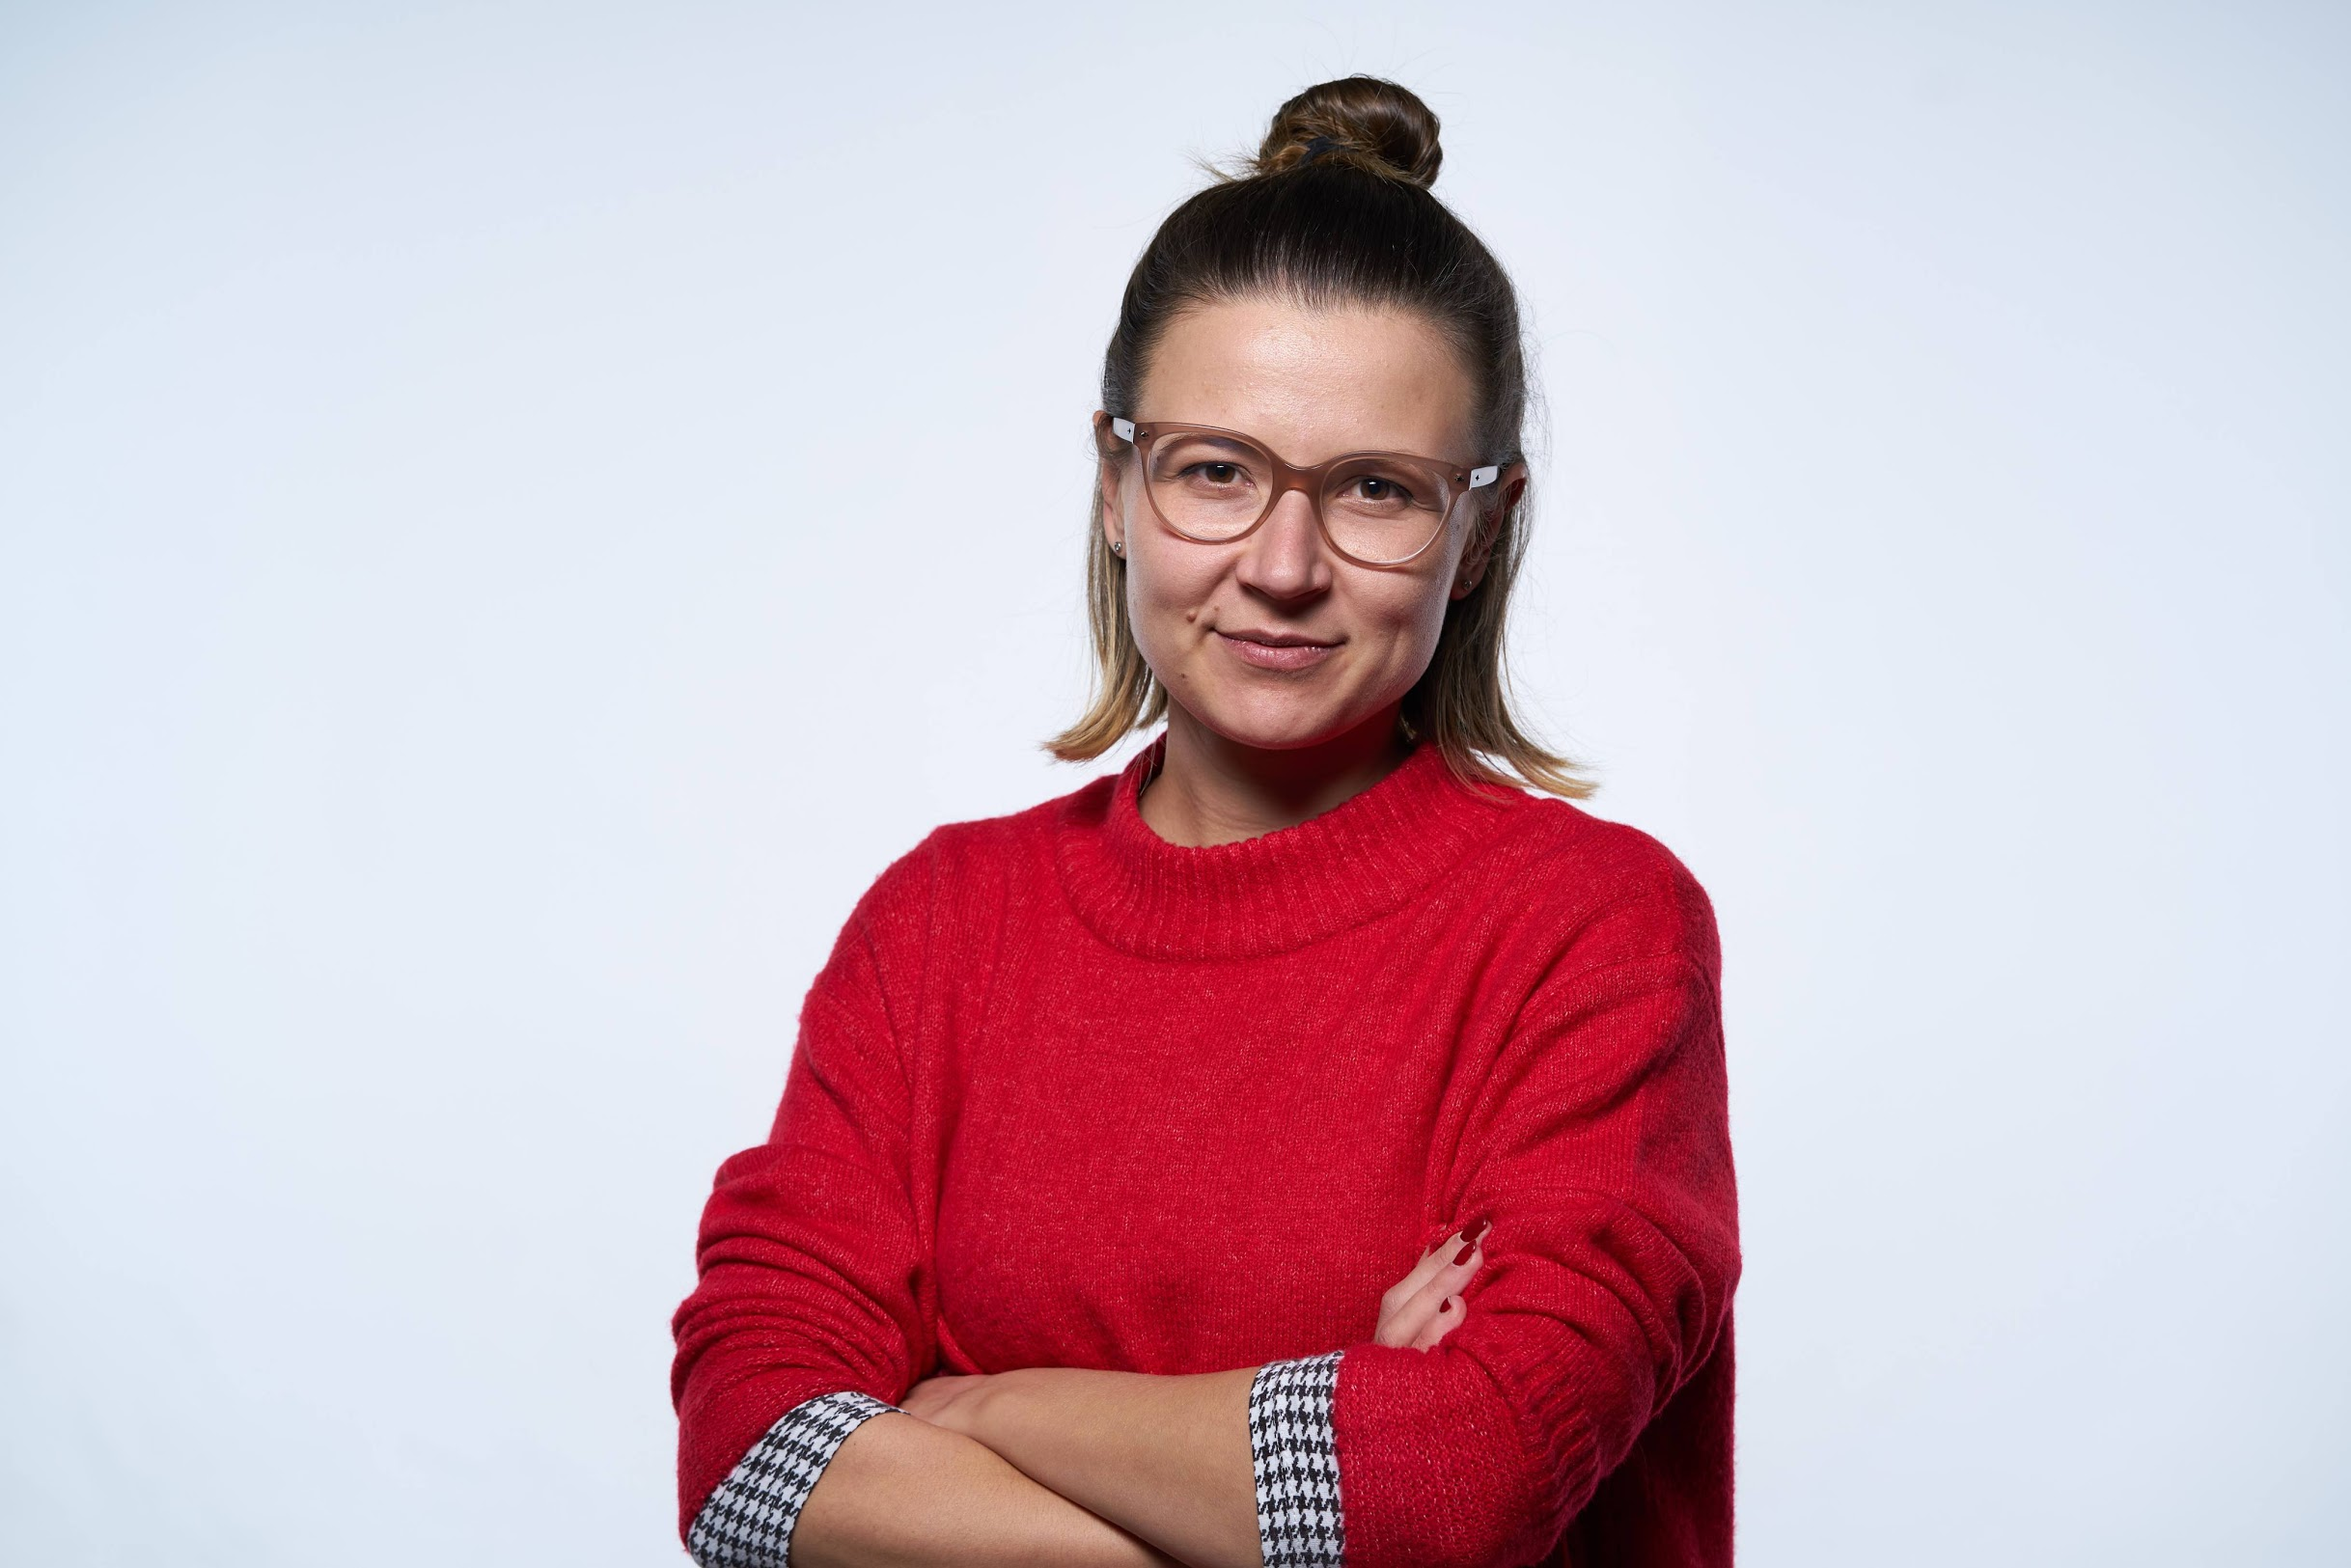 Marta Streker